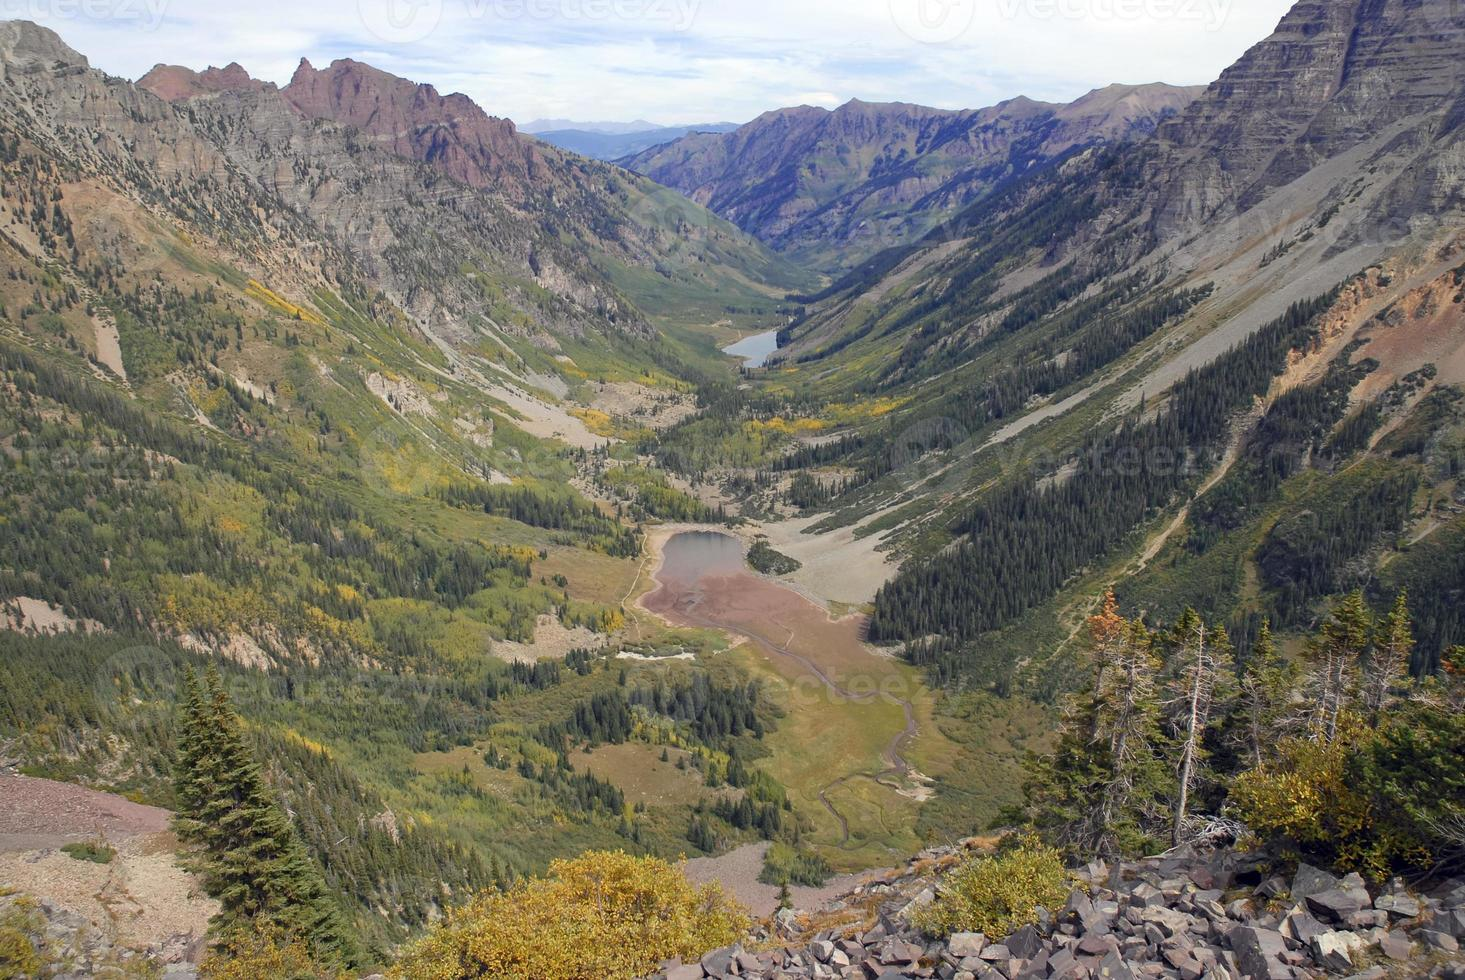 Wandern im Herbstlaub, Rocky Mountains, Colorado foto